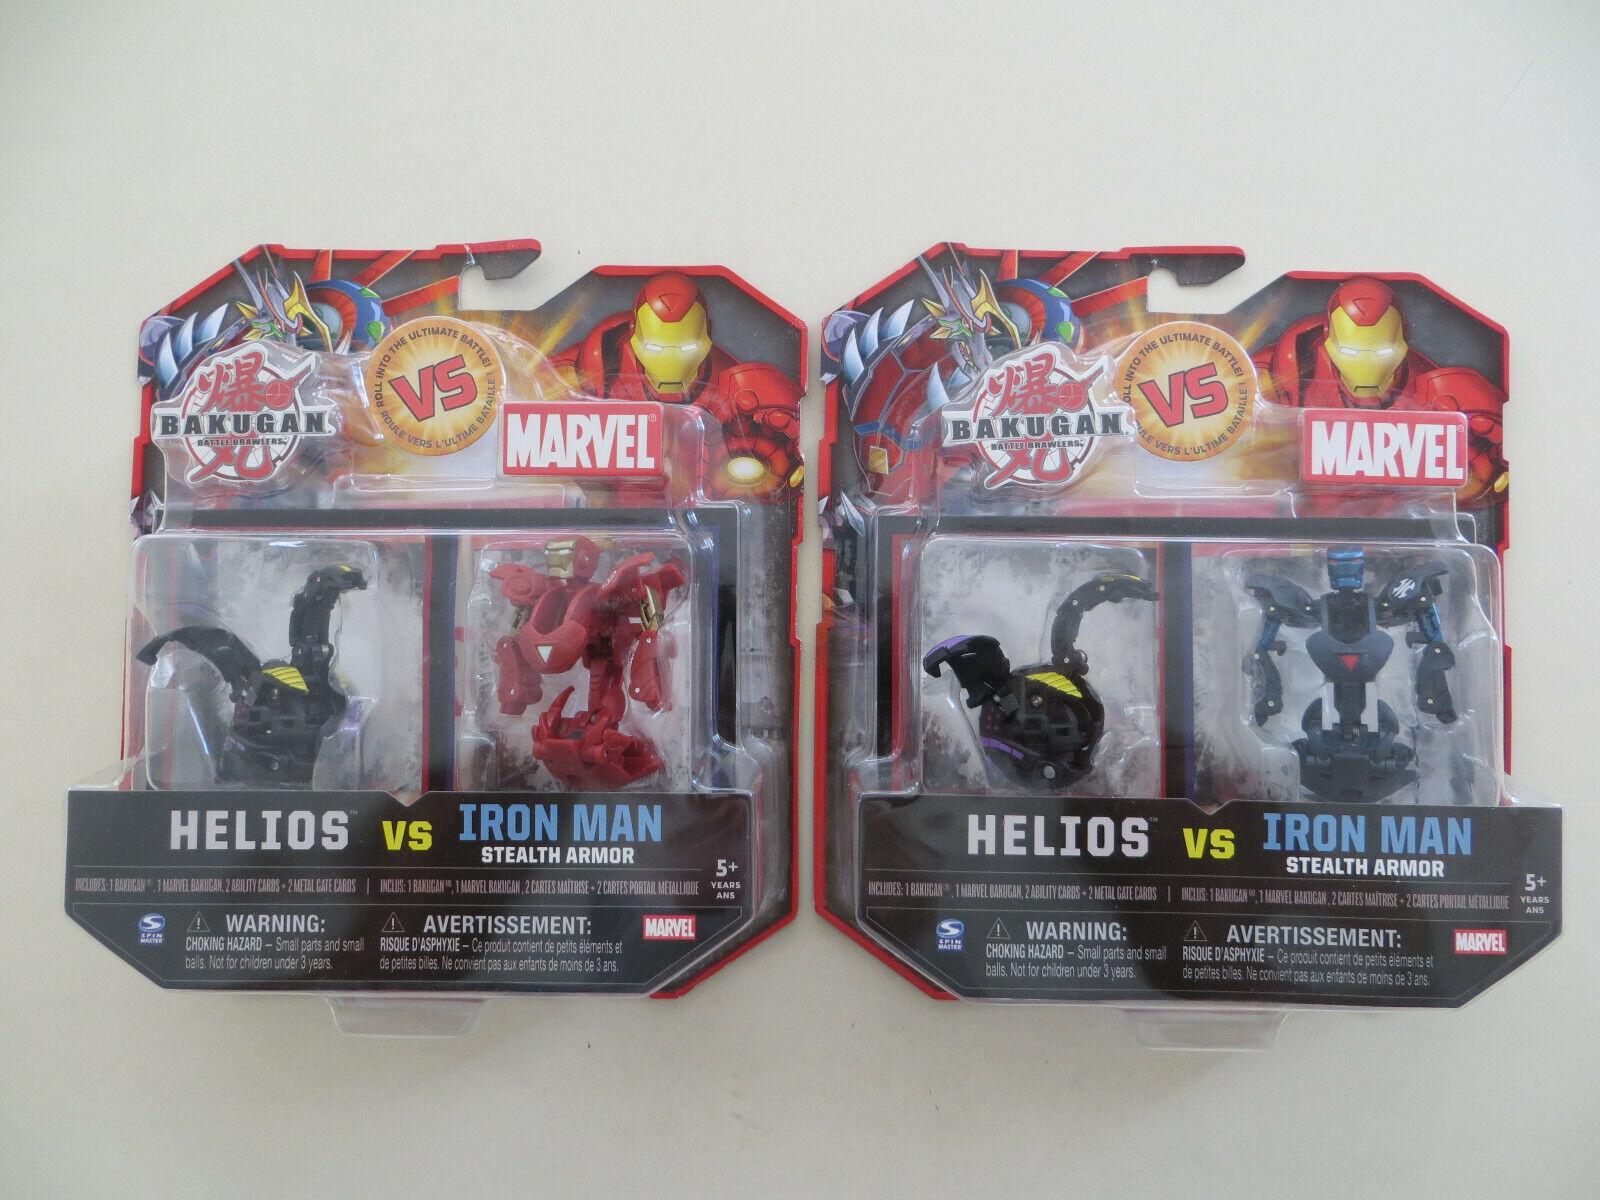 Bakugan Vs Marvel 2 paquetes Helios Vs Armadura Iron Man Stealth Negro Azul Rojo oro